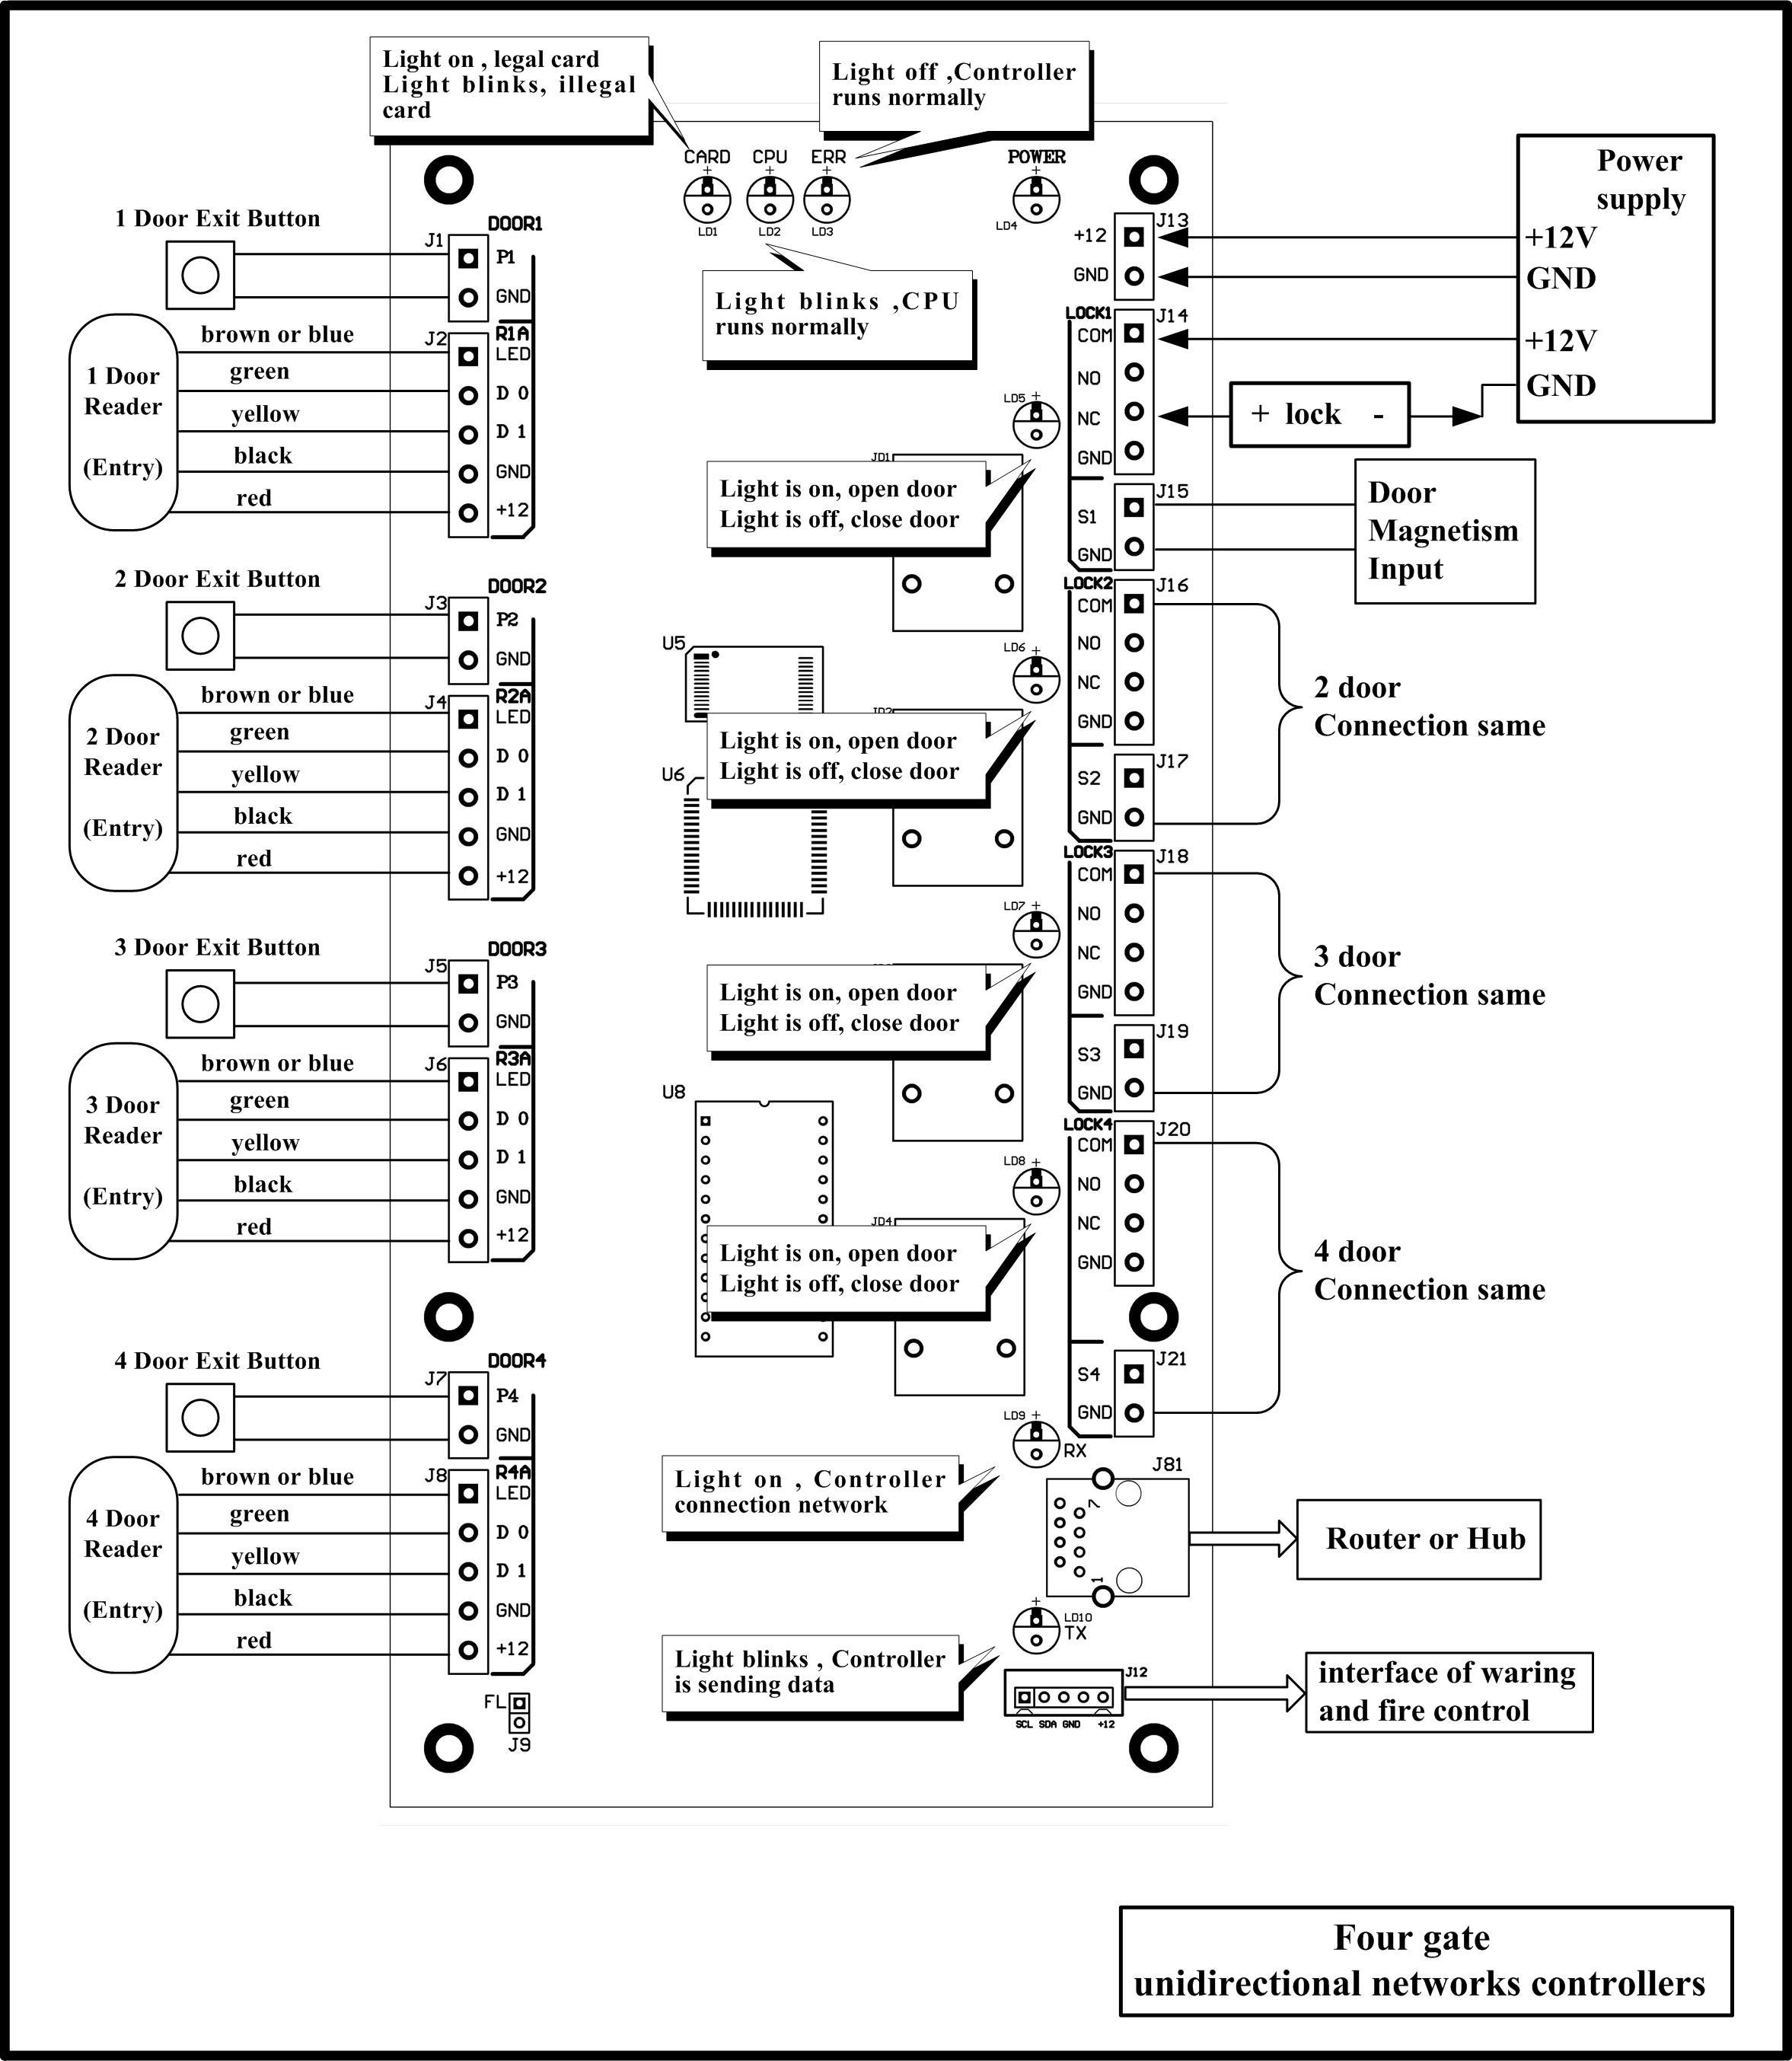 Lenel Access Control Wiring Diagram